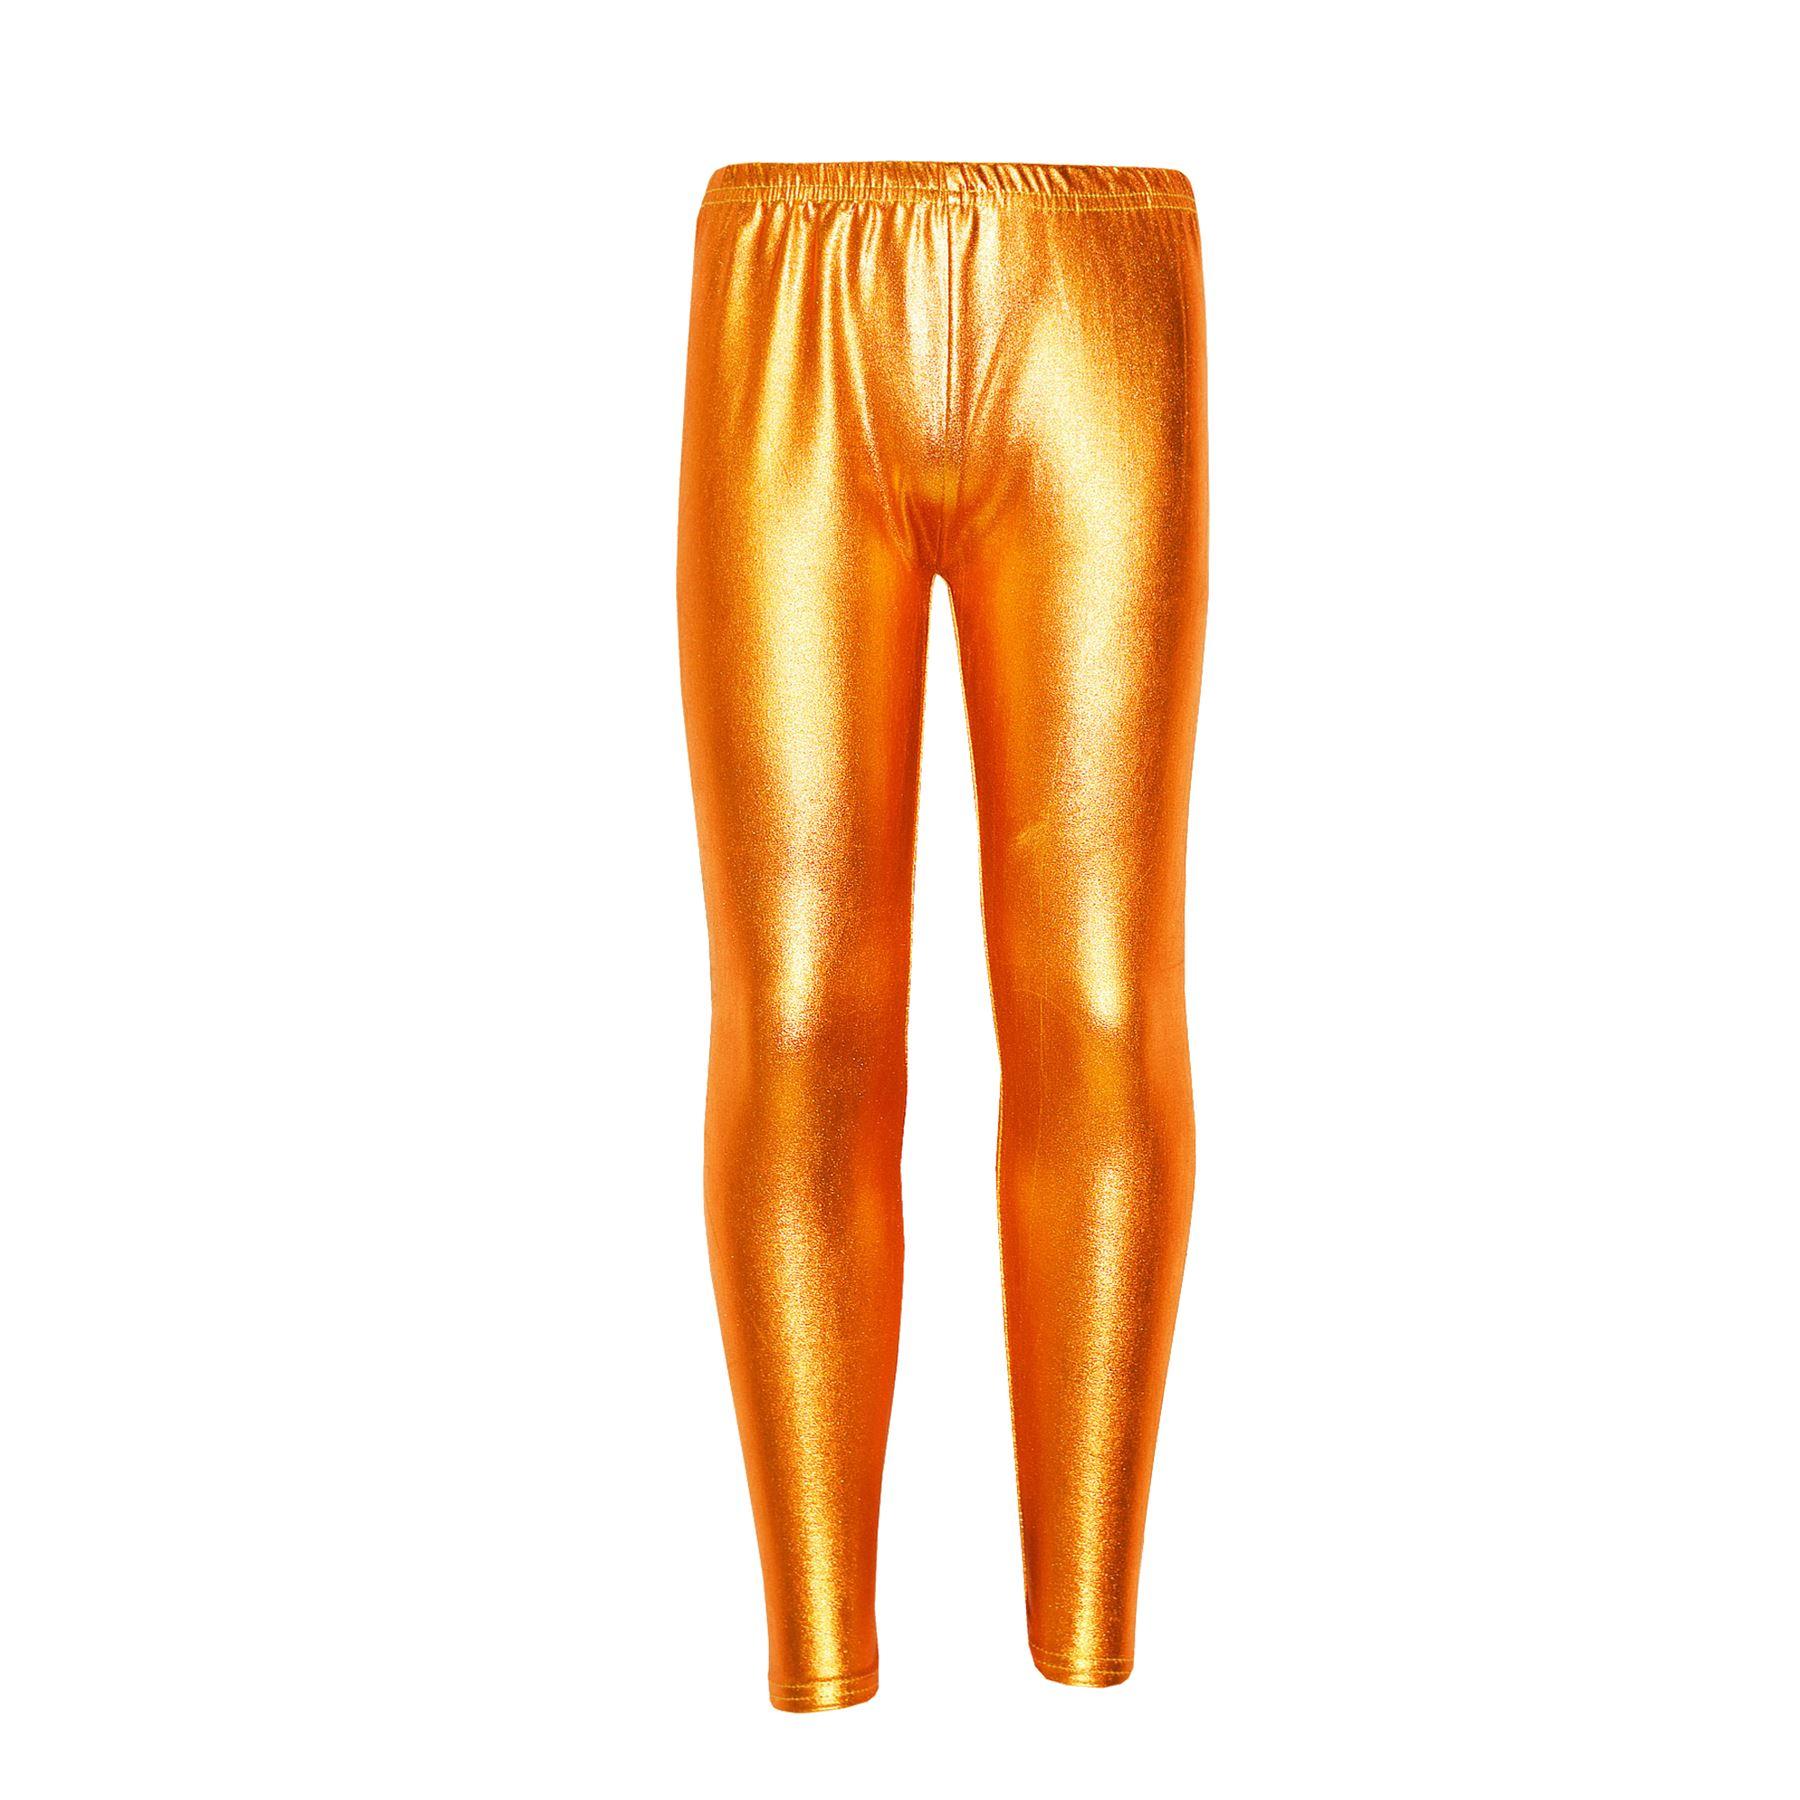 infantil-Leggings-nina-Metalizadas-Brillante-Disco-moderno-BAILE-Edad-4-13-ANOS